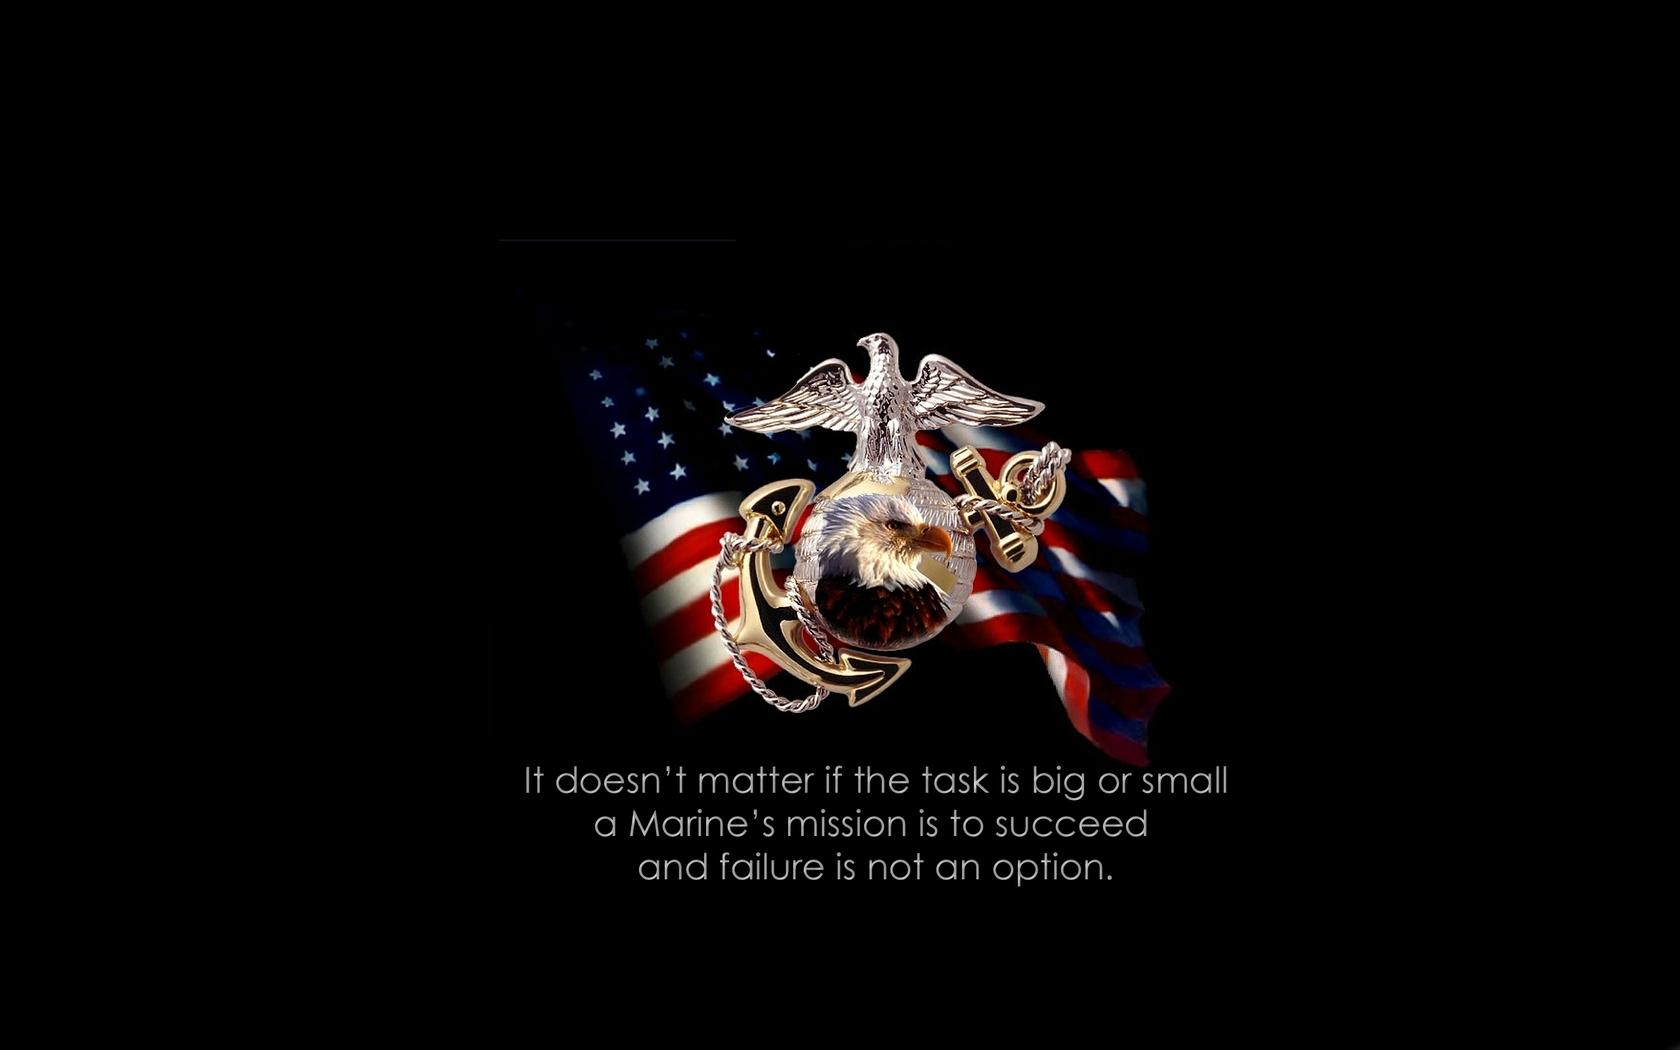 Marine Corp Desktop Wallpaper: Marines HD Wallpaper